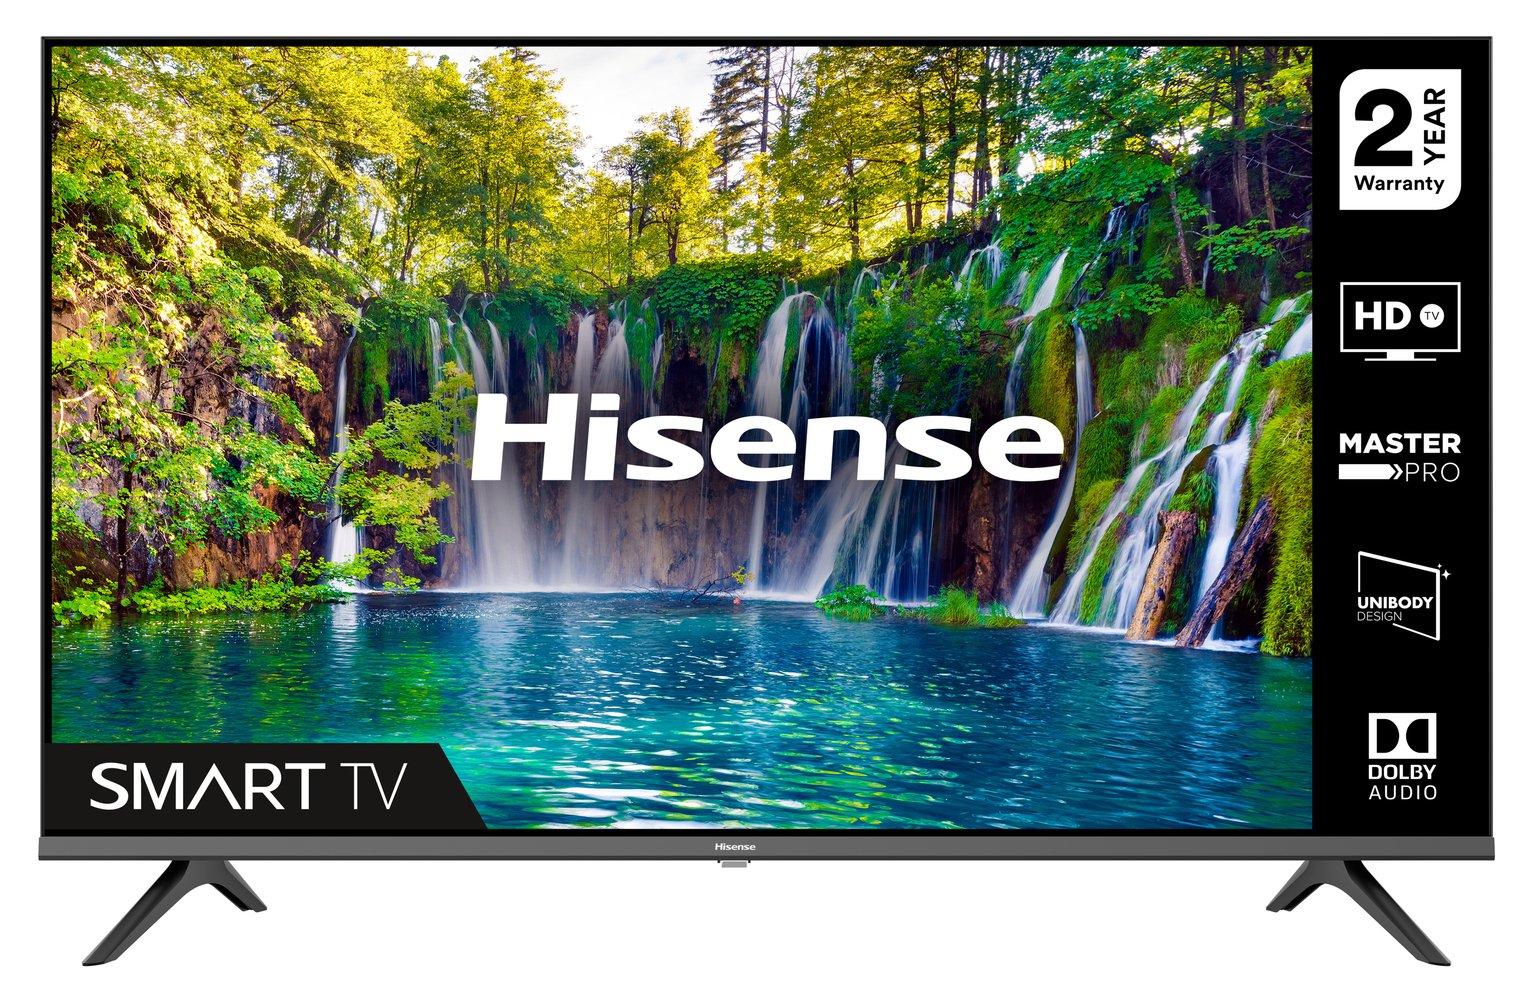 Hisense 32 Inch 32A5600FTUK Smart HD Ready LED Freeview TV